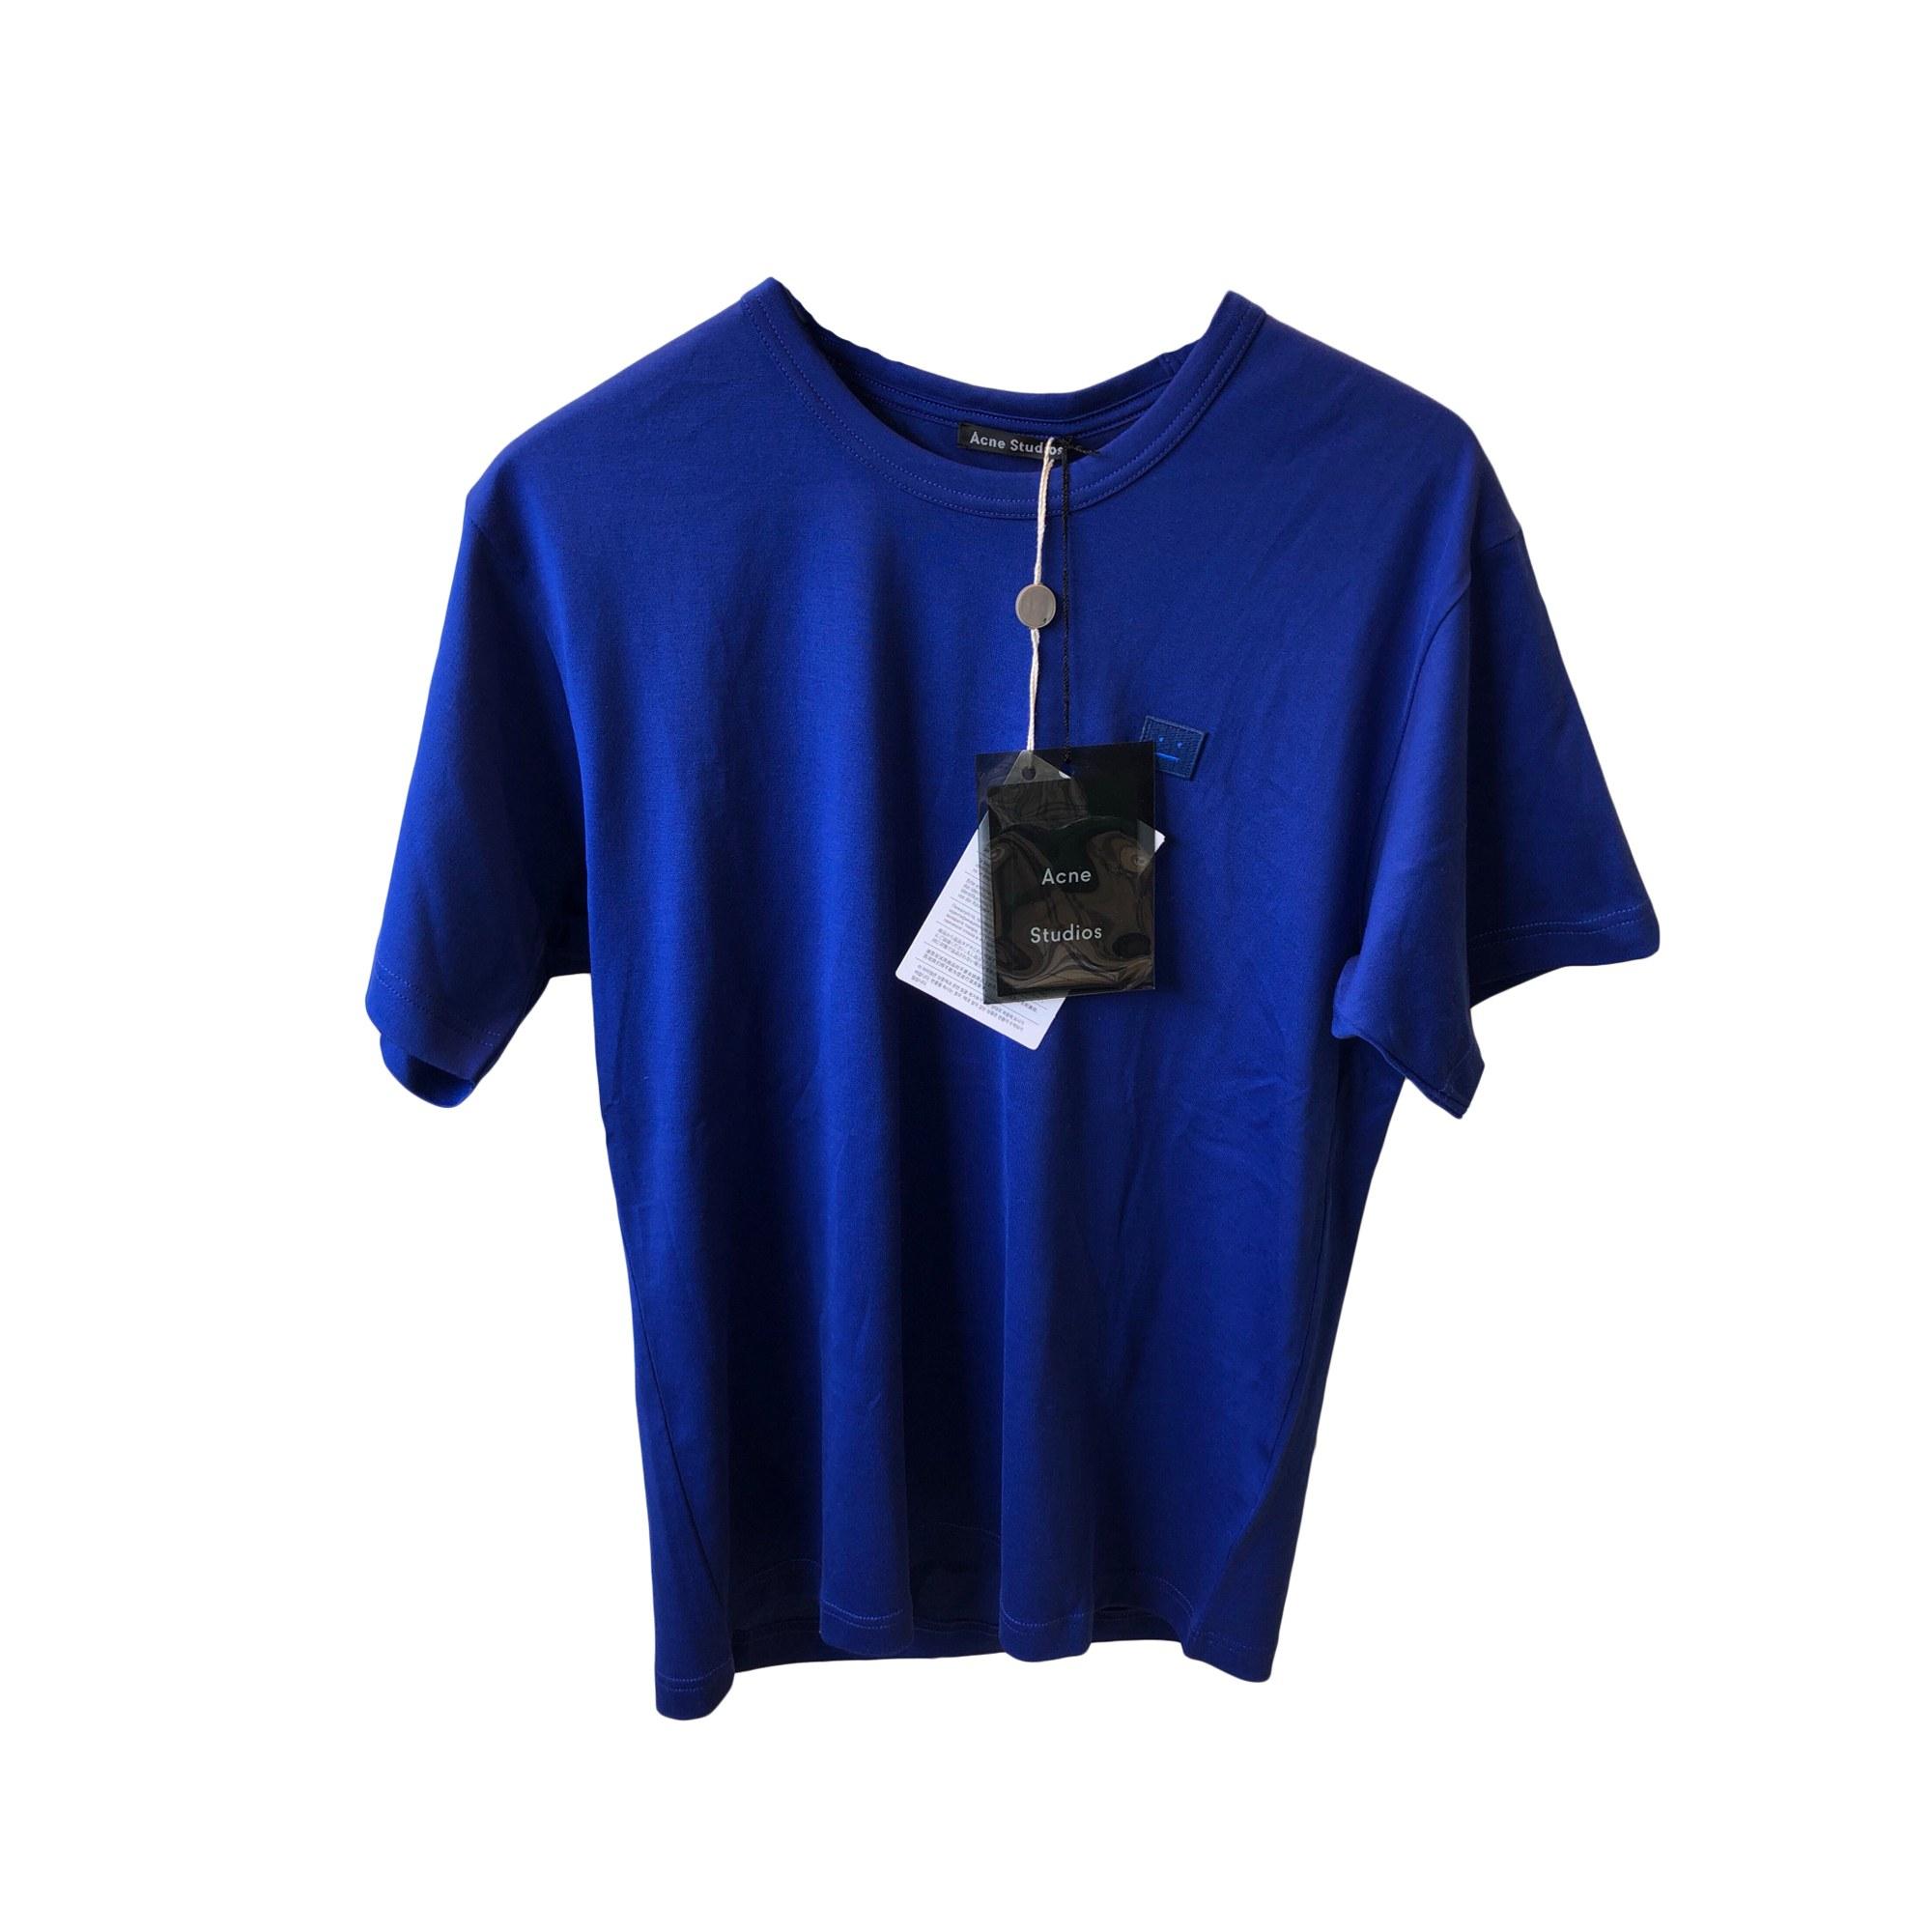 T-shirt ACNE Blu, blu navy, turchese